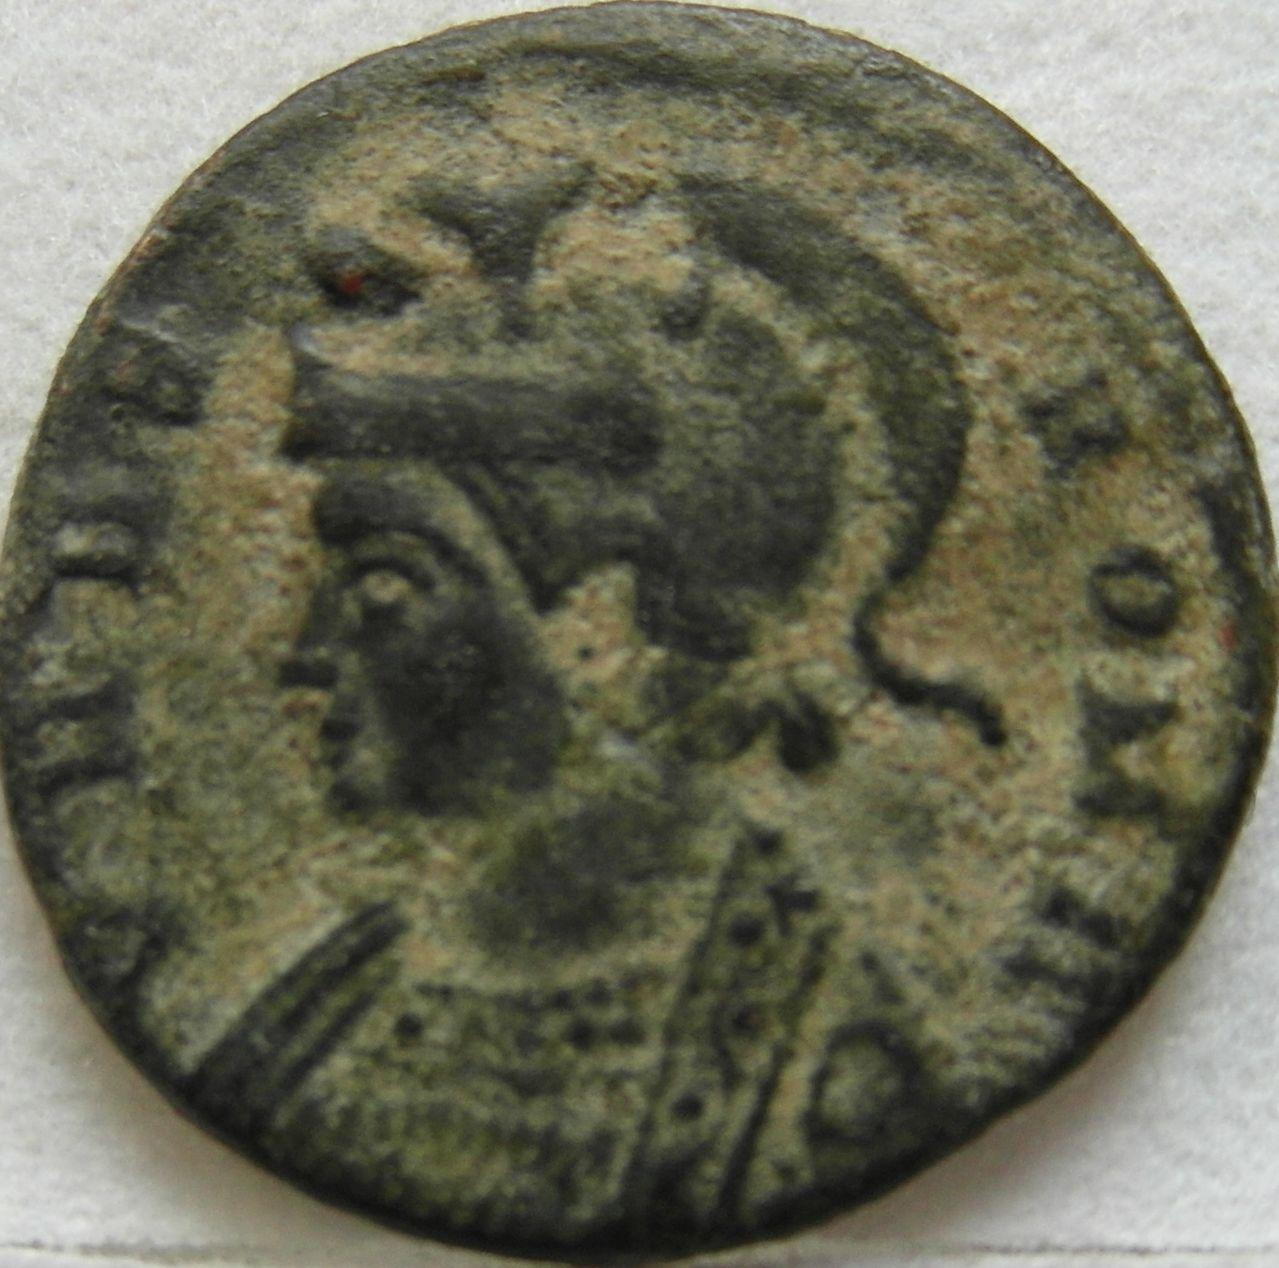 AE3 Conmemorativa de Roma. Lyon SAM_0216_crop